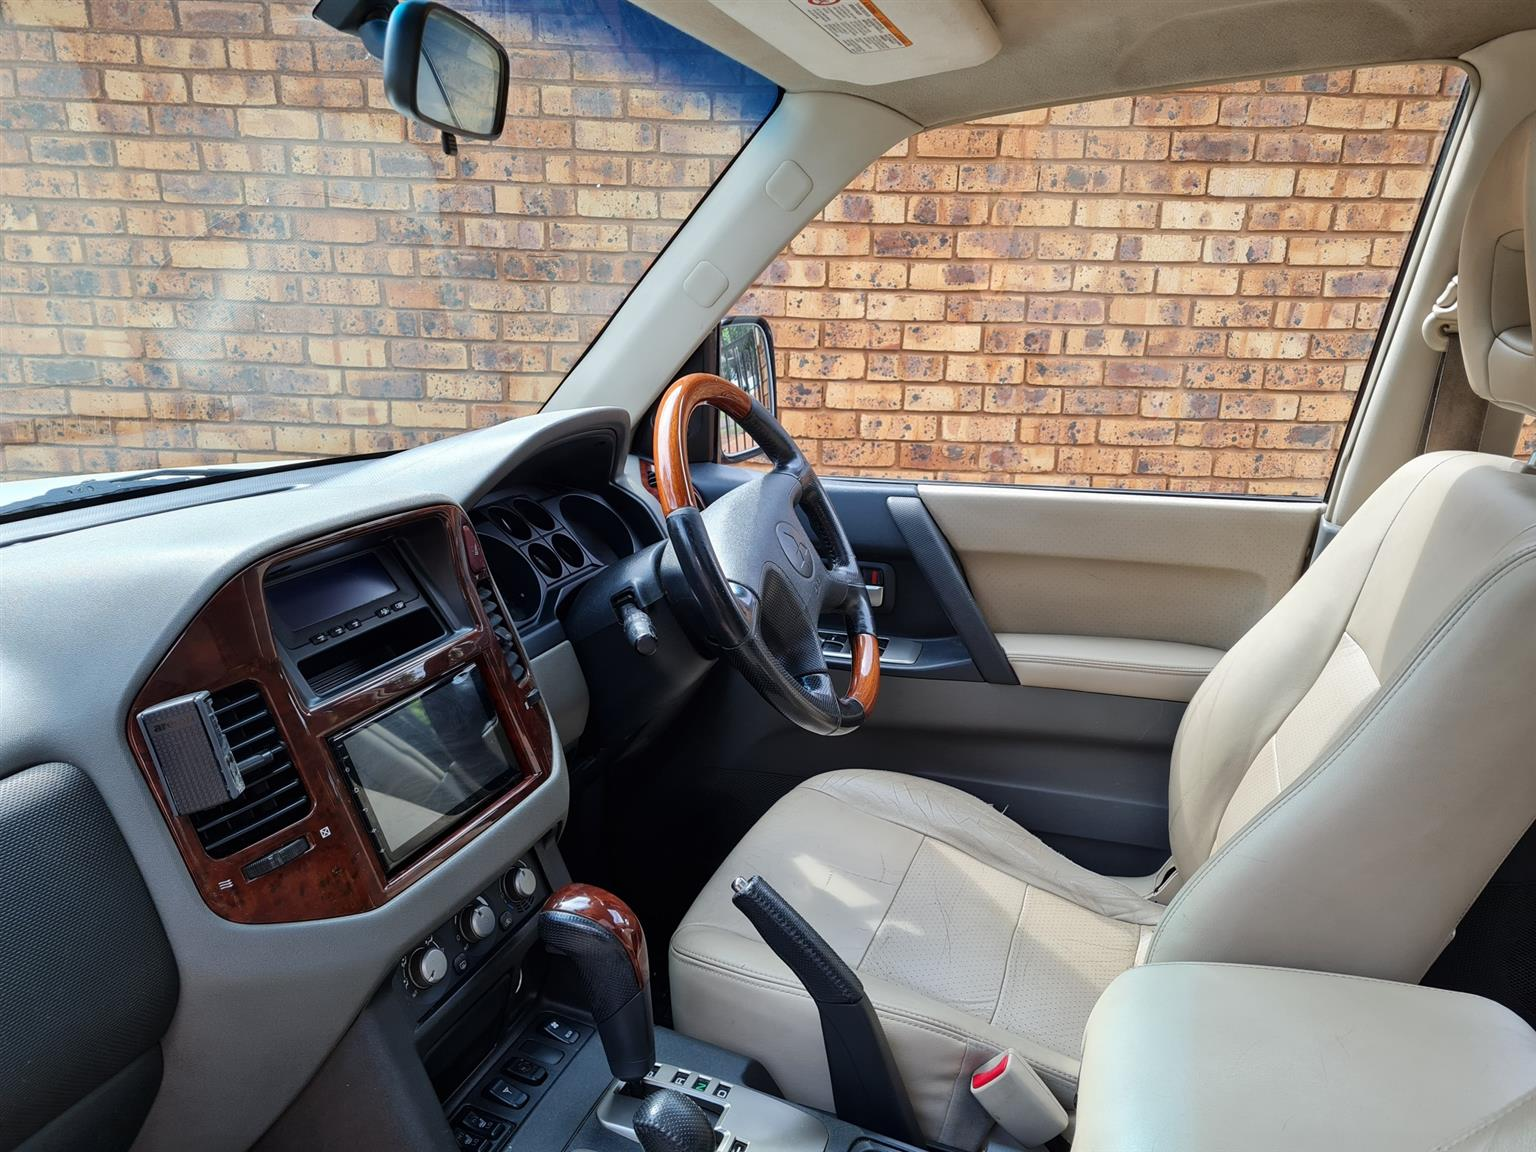 Mitsubishi Pajero 4x4, 2006, Diesel , GLS, LWB, automatic